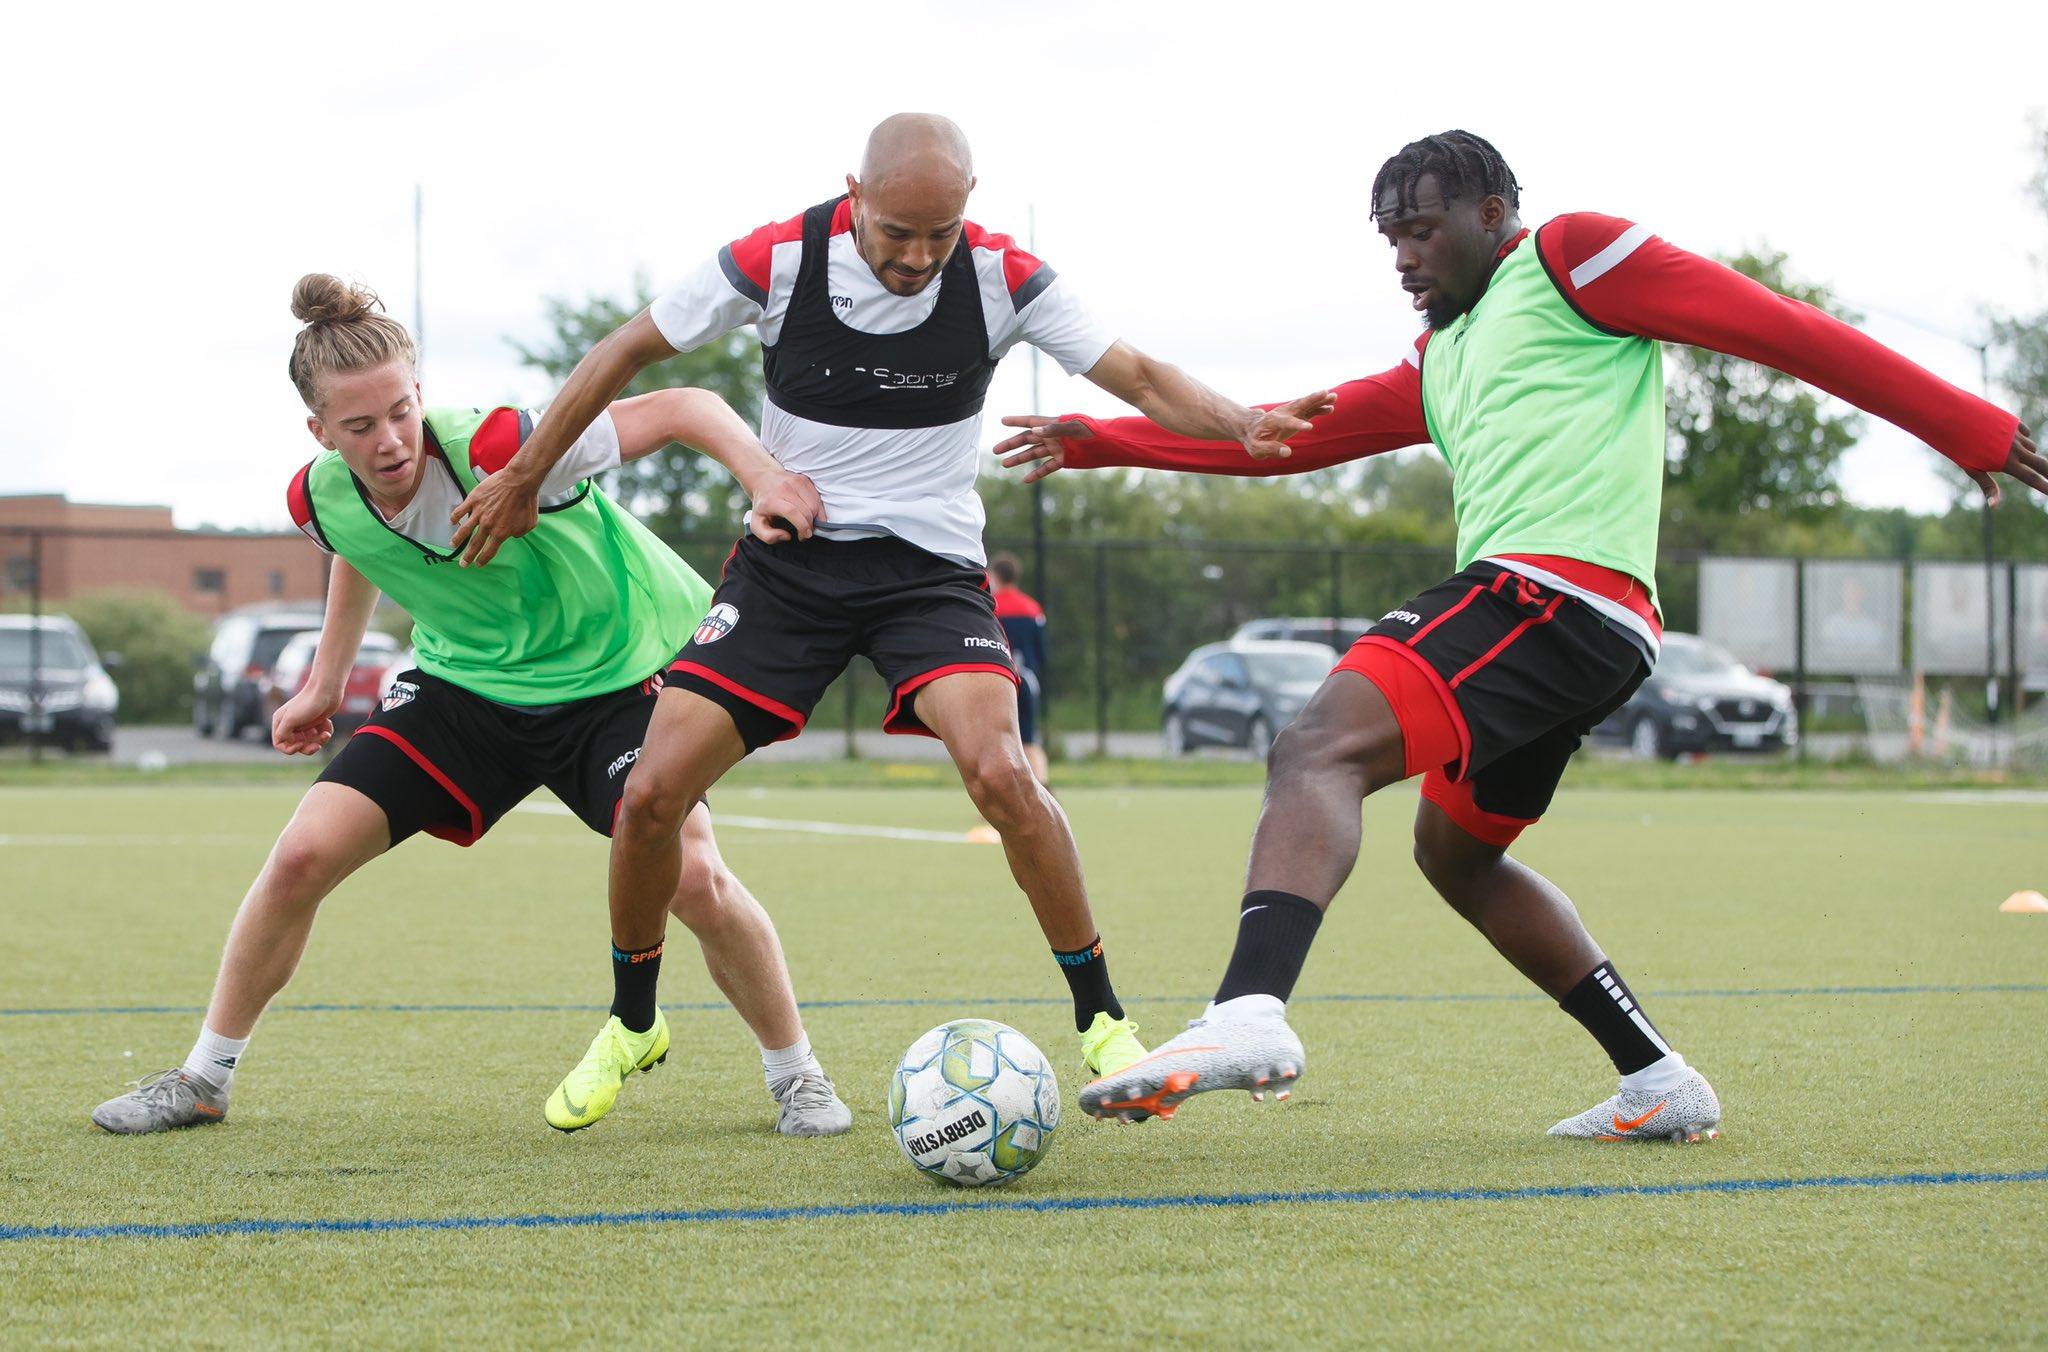 Atlético Ottawa's Antoine Coupland, Francisco Acuña, and Kunle Dada-Luke battle for possession. (Atlético Ottawa)